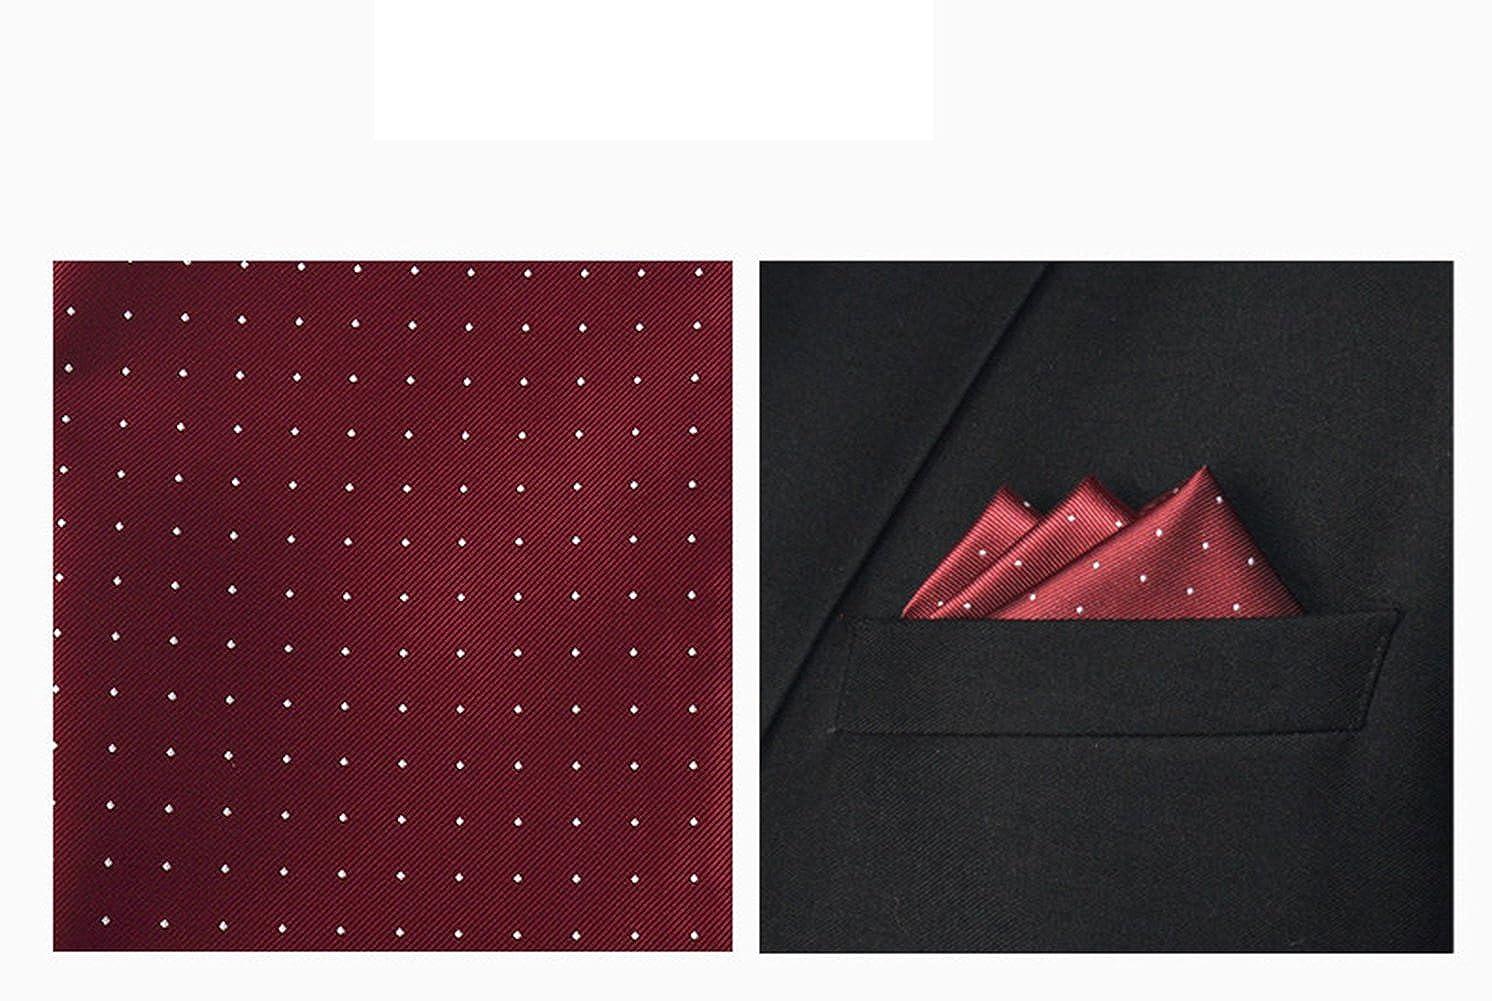 L04BABY Mens Bowtie Set Pack Bowtie+Lapel Pin+Pocket Square+Gift Box